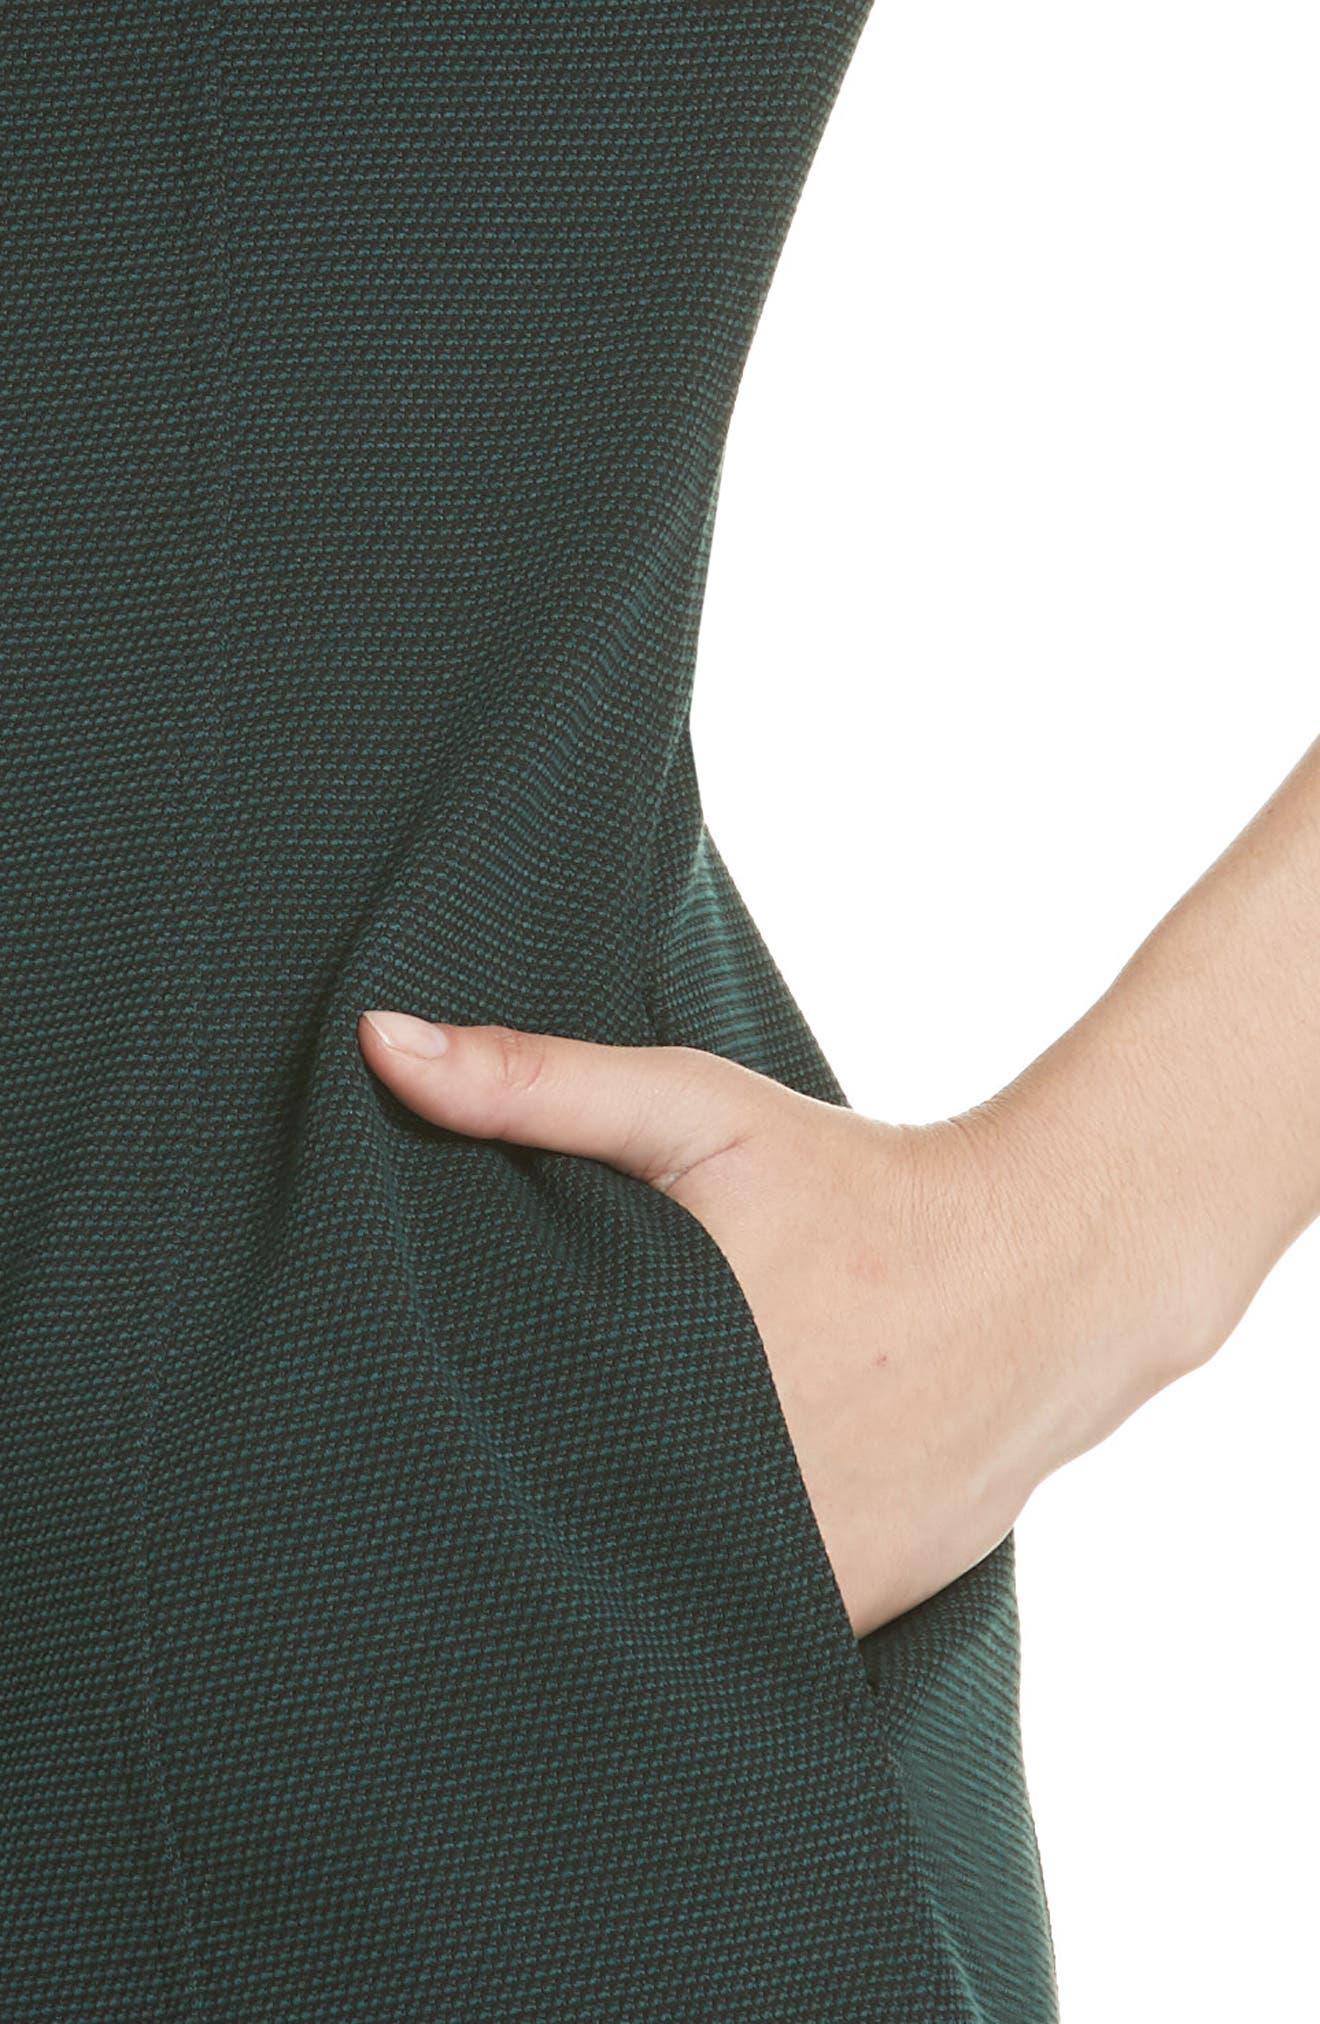 Easy Snap Textured Dress,                             Alternate thumbnail 4, color,                             GREEN POPLAR/ POP NAVY